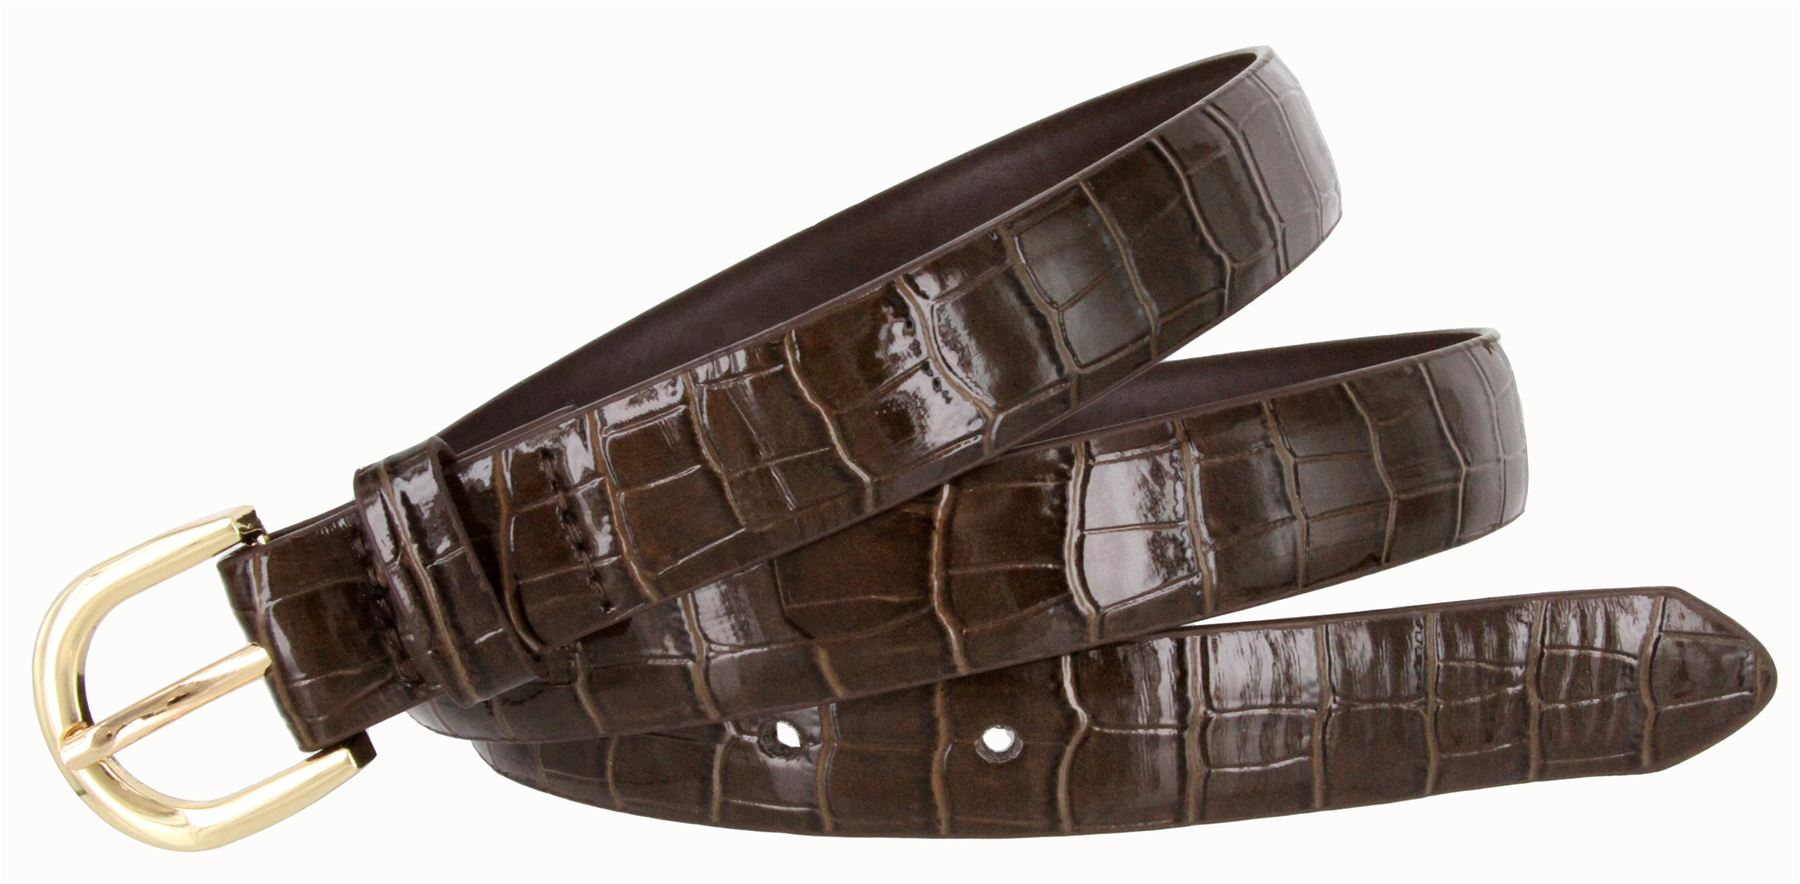 Women-039-s-Skinny-Thin-Alligator-Embossed-Genuine-Leather-Belt-1-034-25mm-Wide thumbnail 9